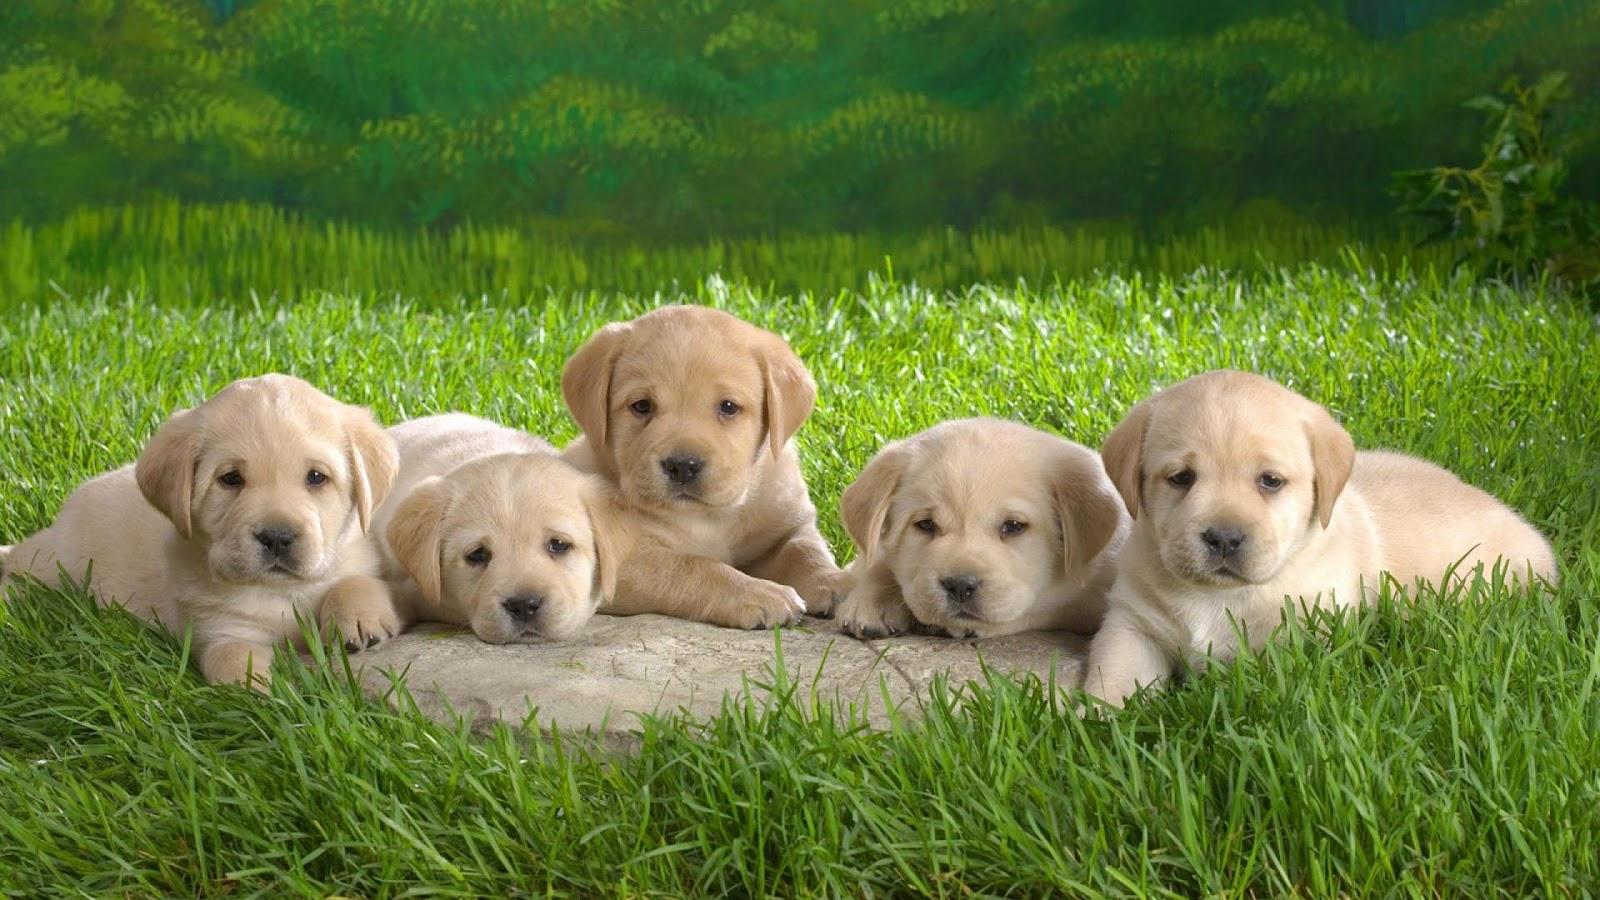 Cute Puppies HD wallpaper 1080p